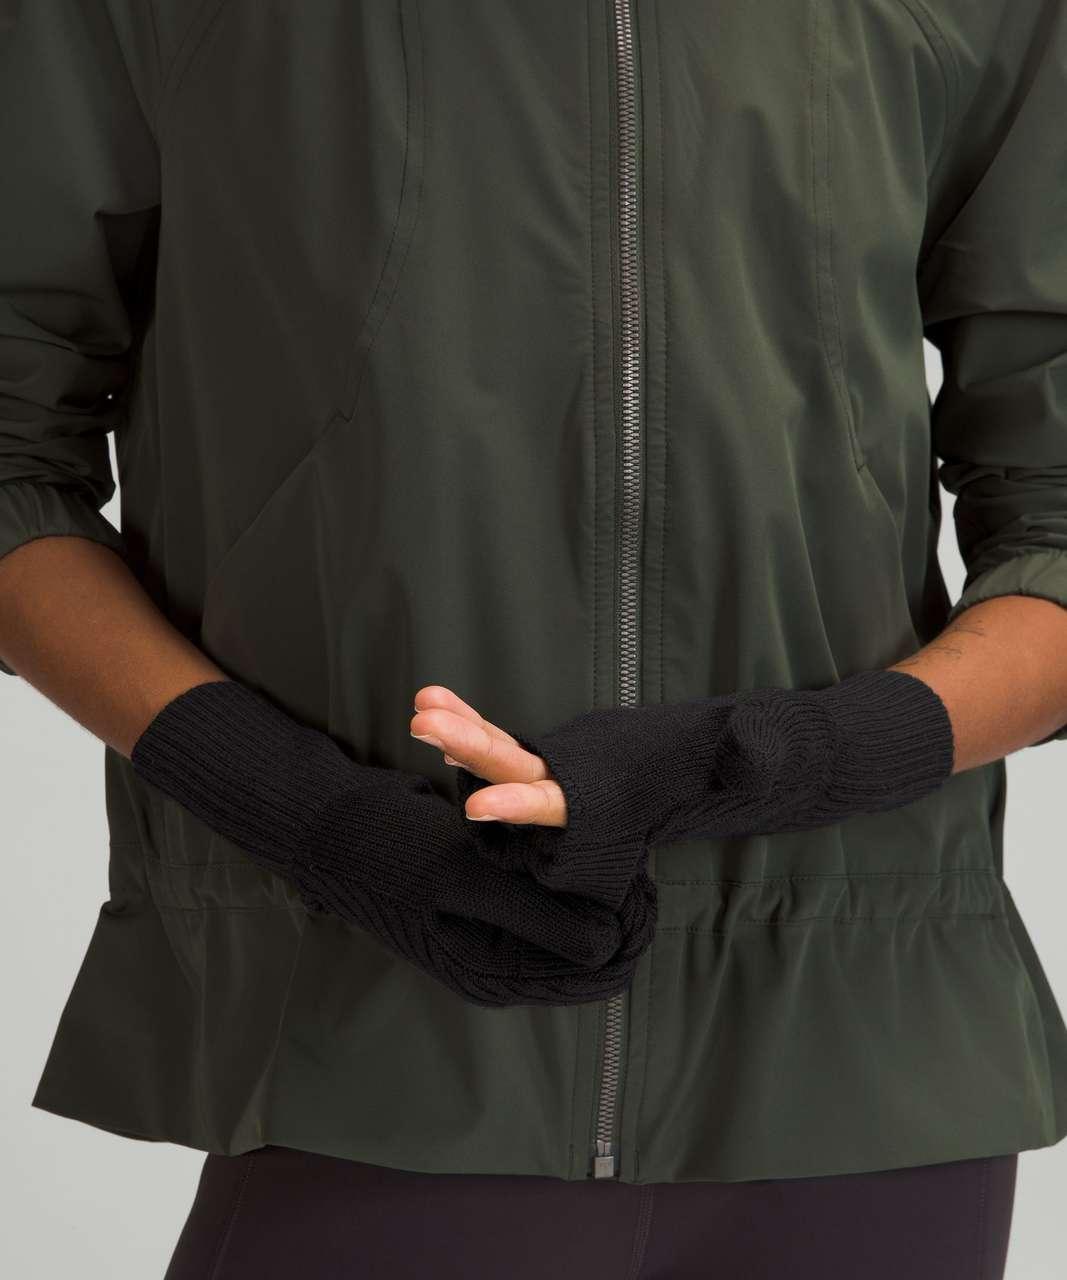 Lululemon Twist Knit Mittens - Black